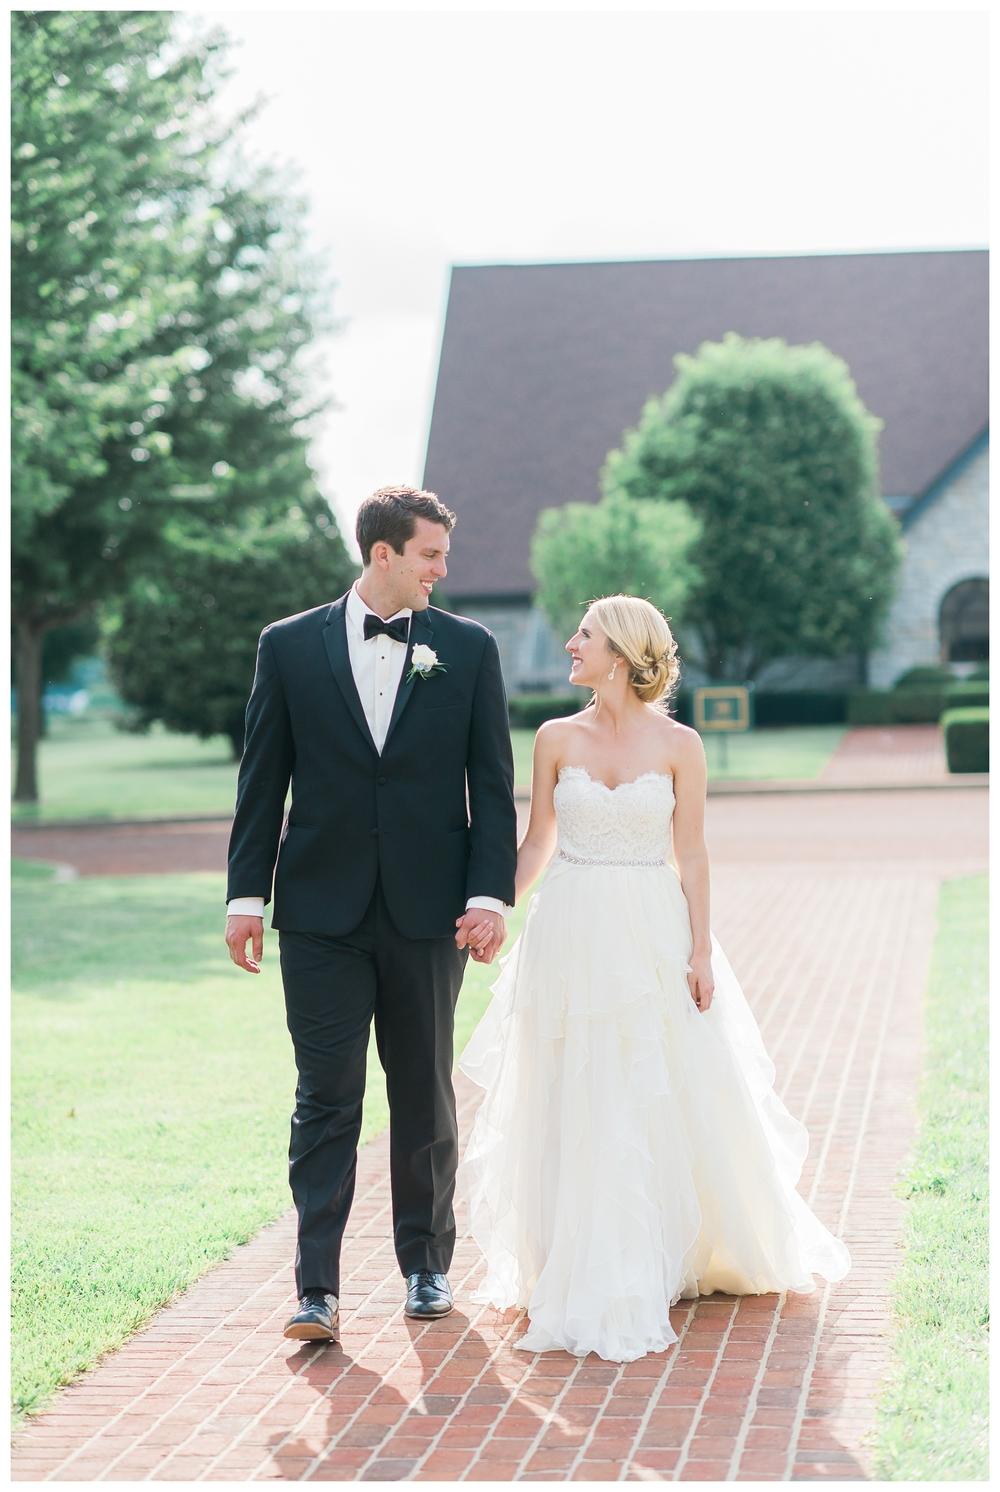 Rebecca_Bridges_Photography_Indianapolis_Wedding_Photographer_4598.jpg